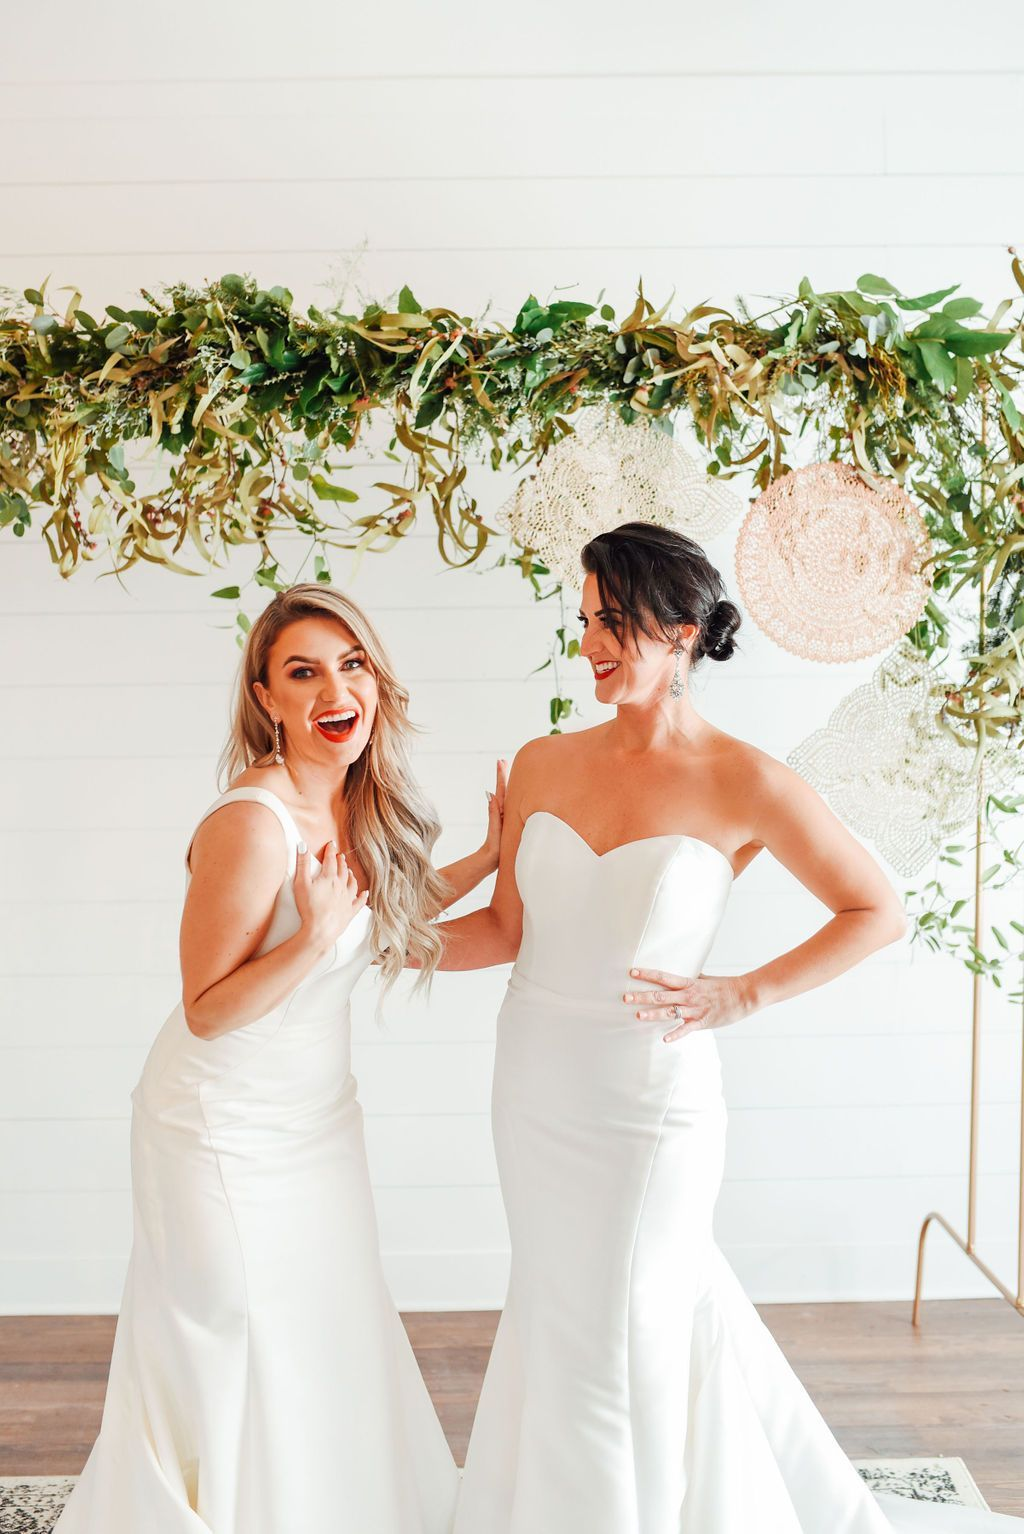 The Wedding Studio in Greenwood Indiana offers a u in 2020